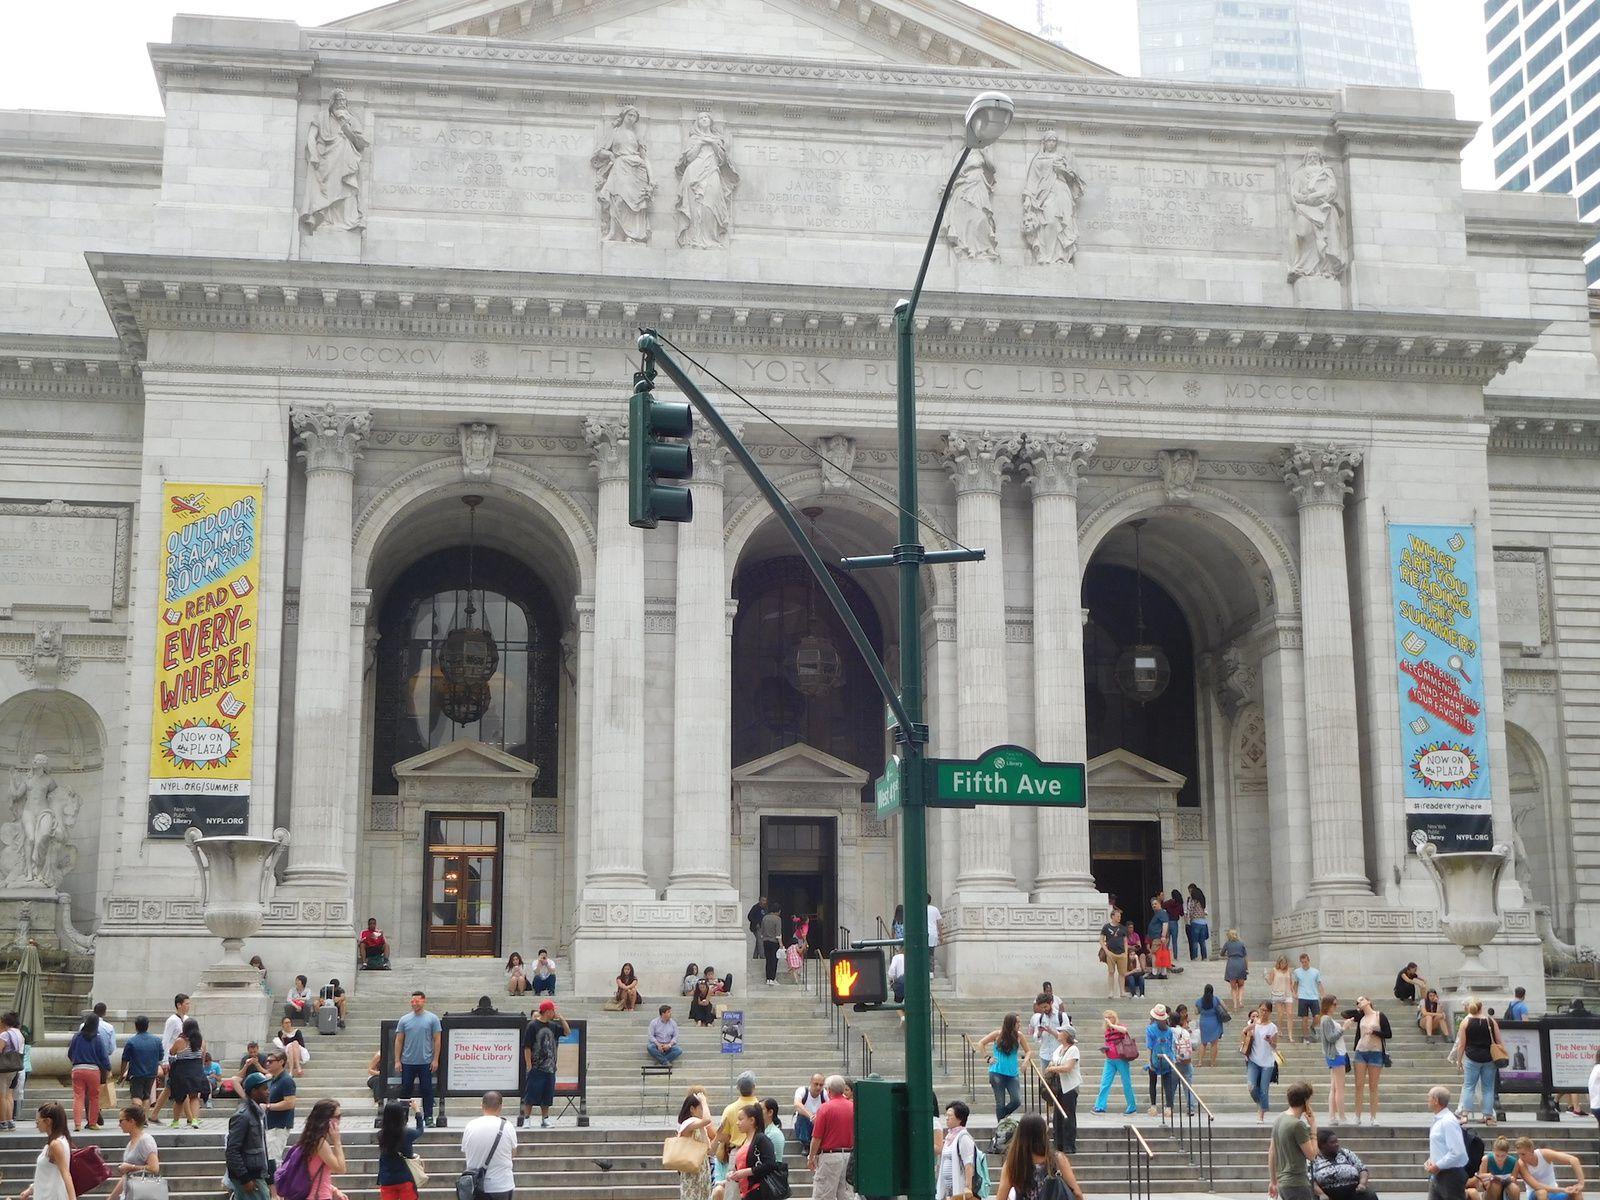 La Public Library